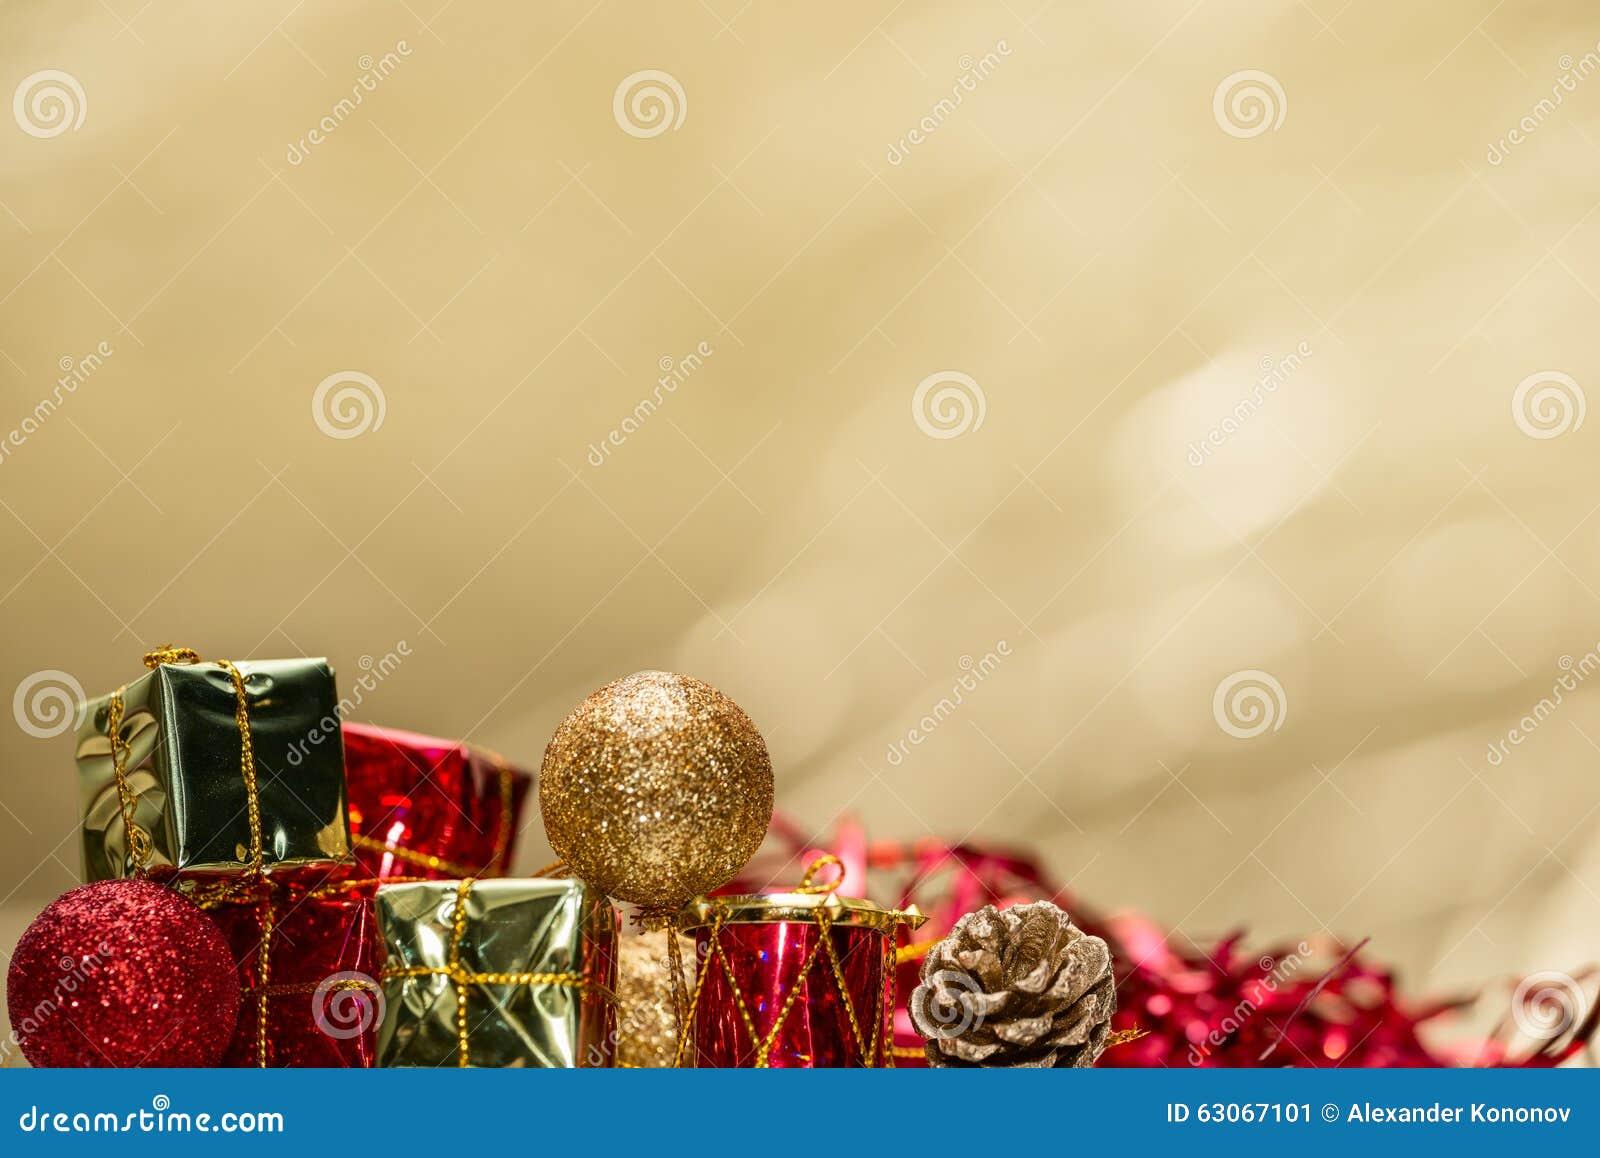 Christmas tiny toys stock image. Image of mood, toys - 63067101